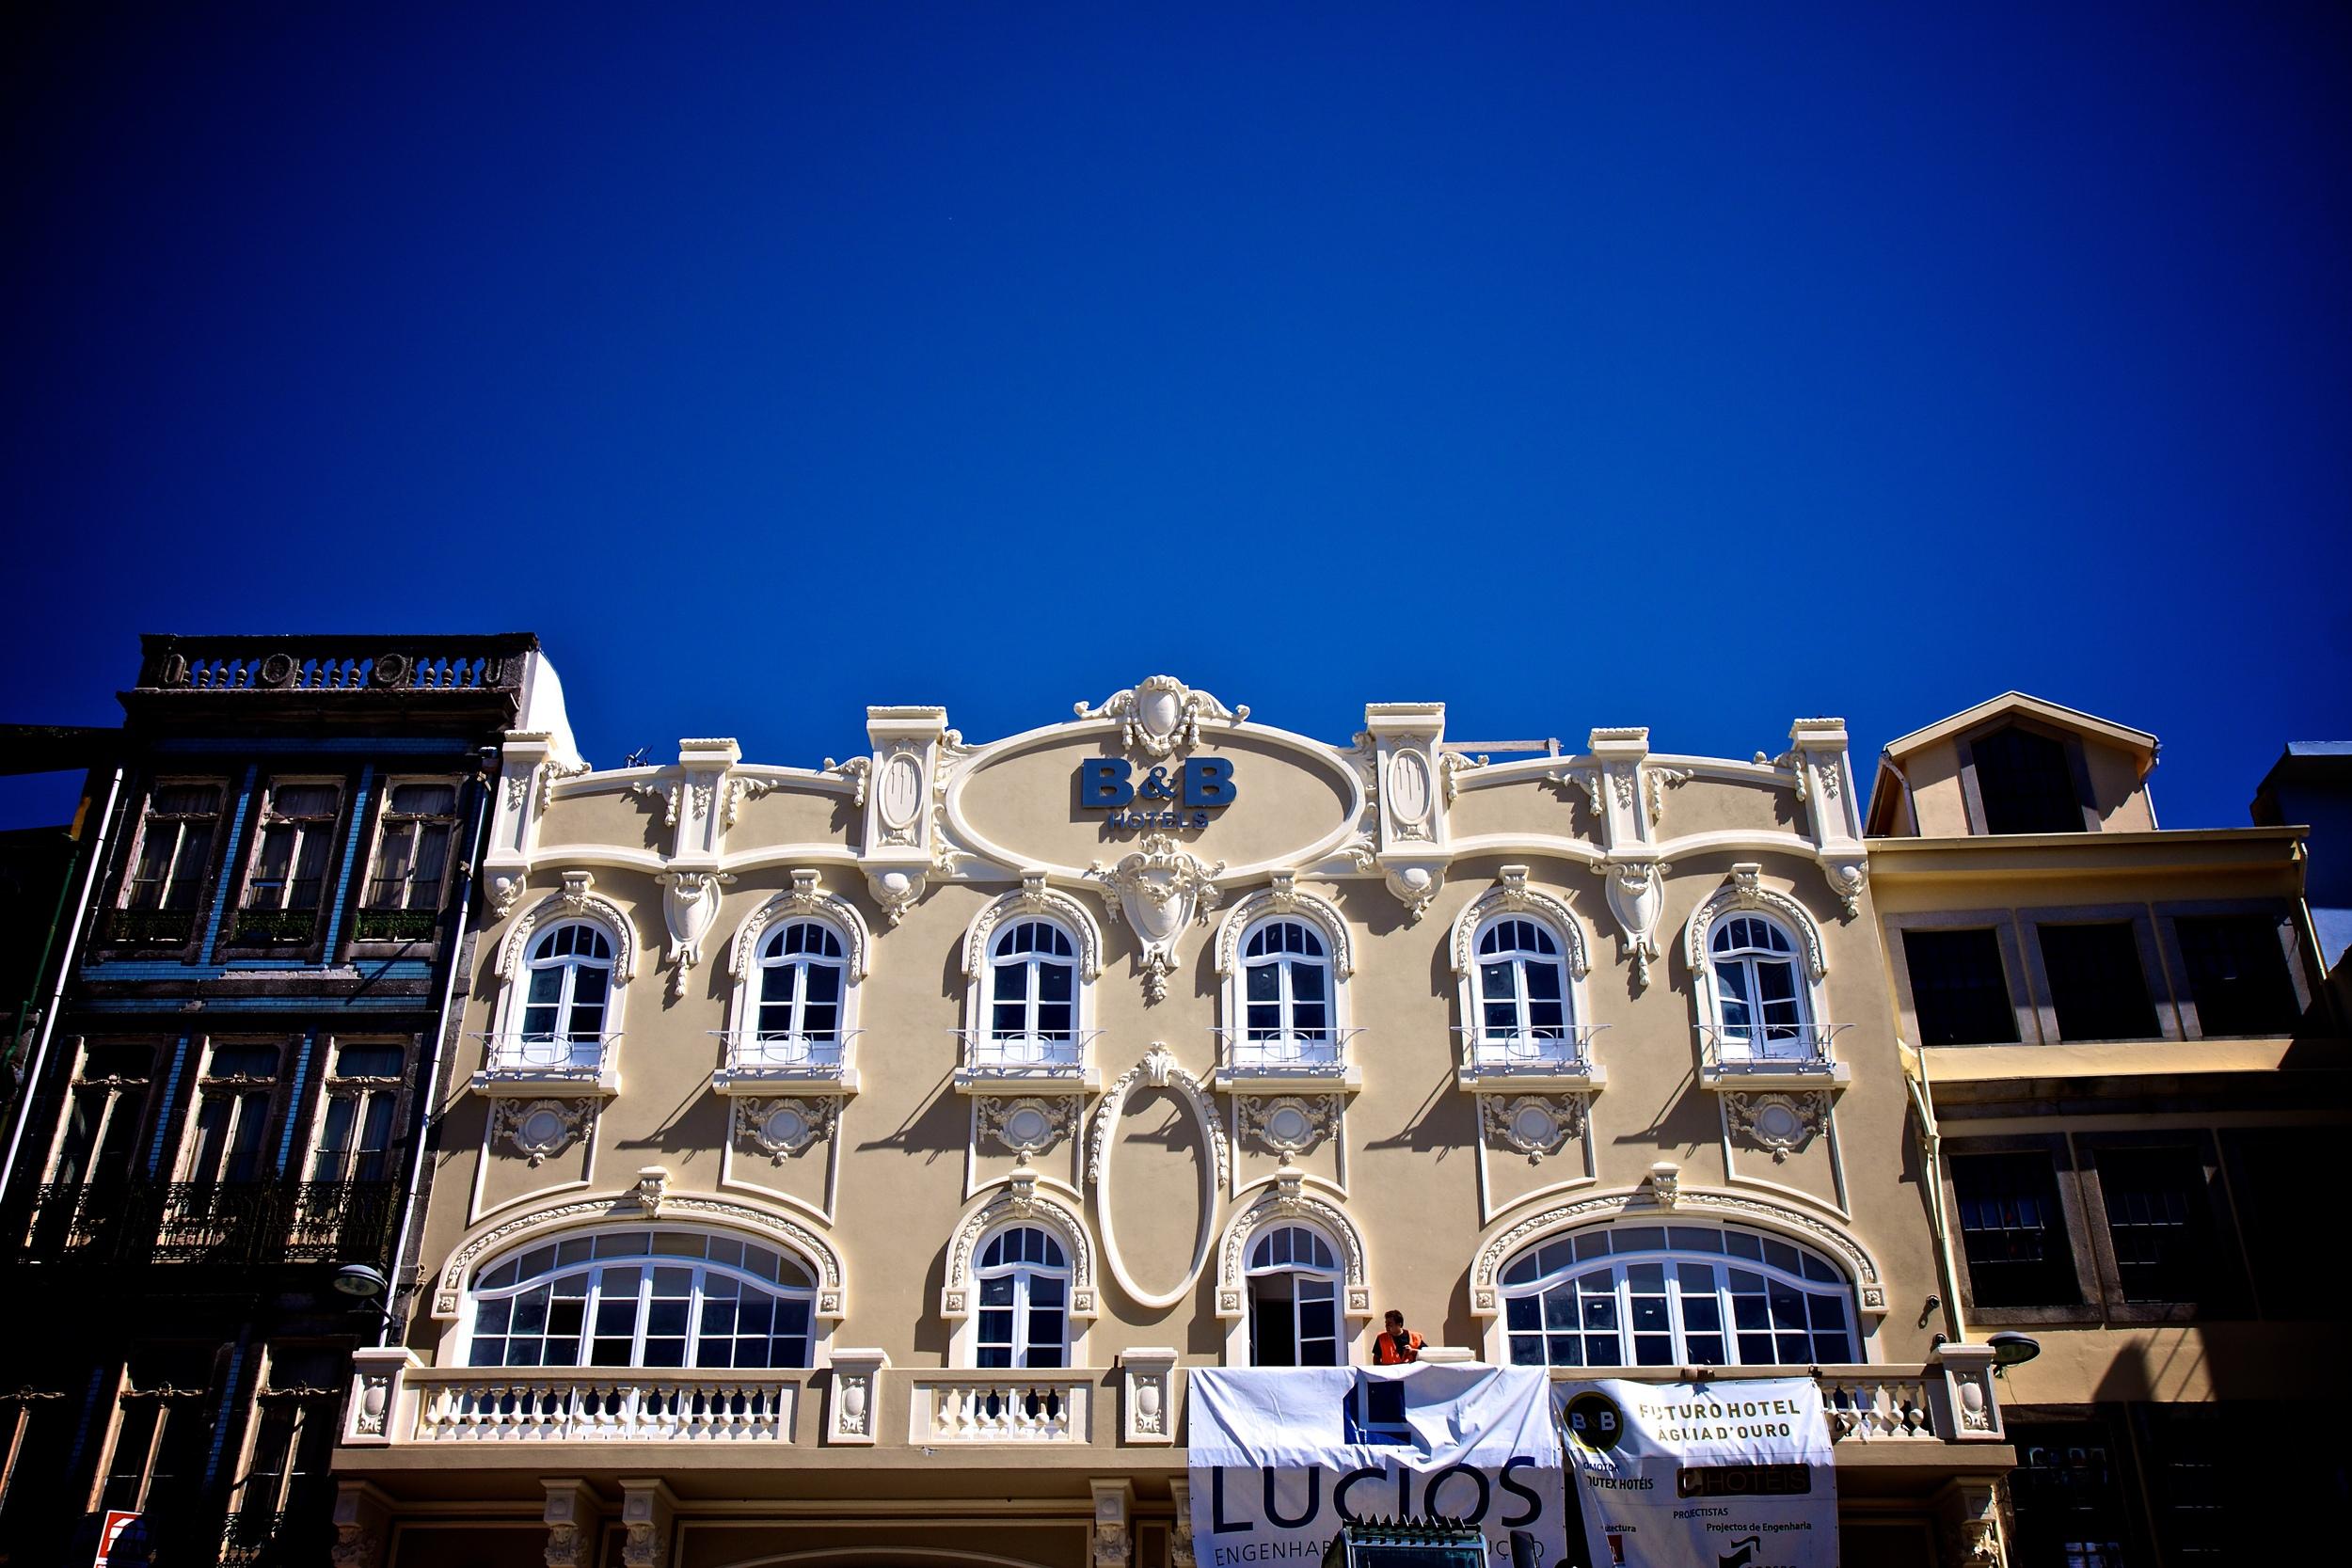 porto-juillet-2011-297.jpg